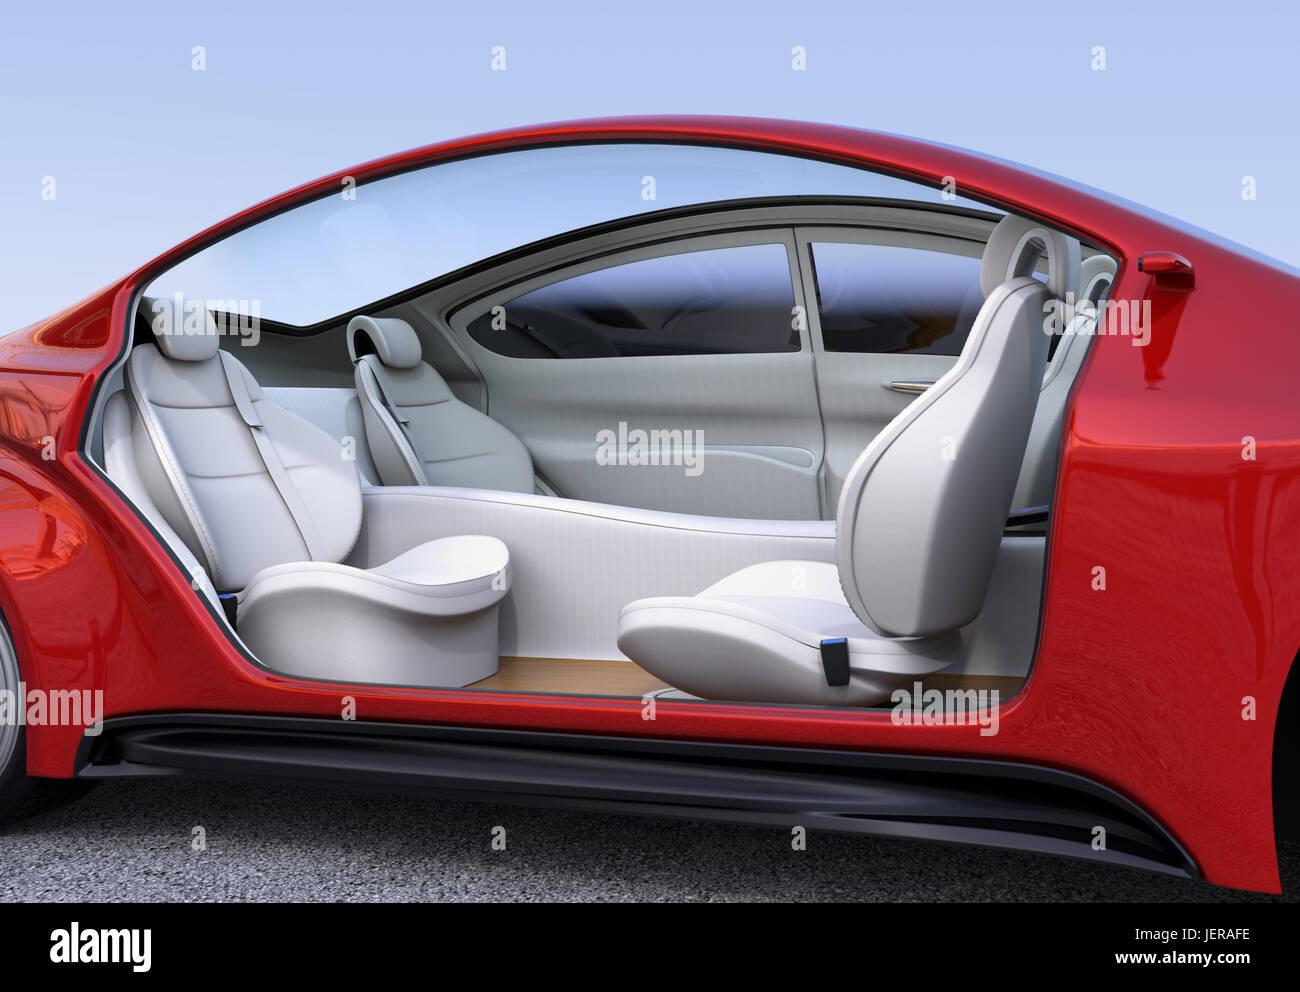 Self Driving Car Interior Concept Front Stockfotos & Self Driving ...